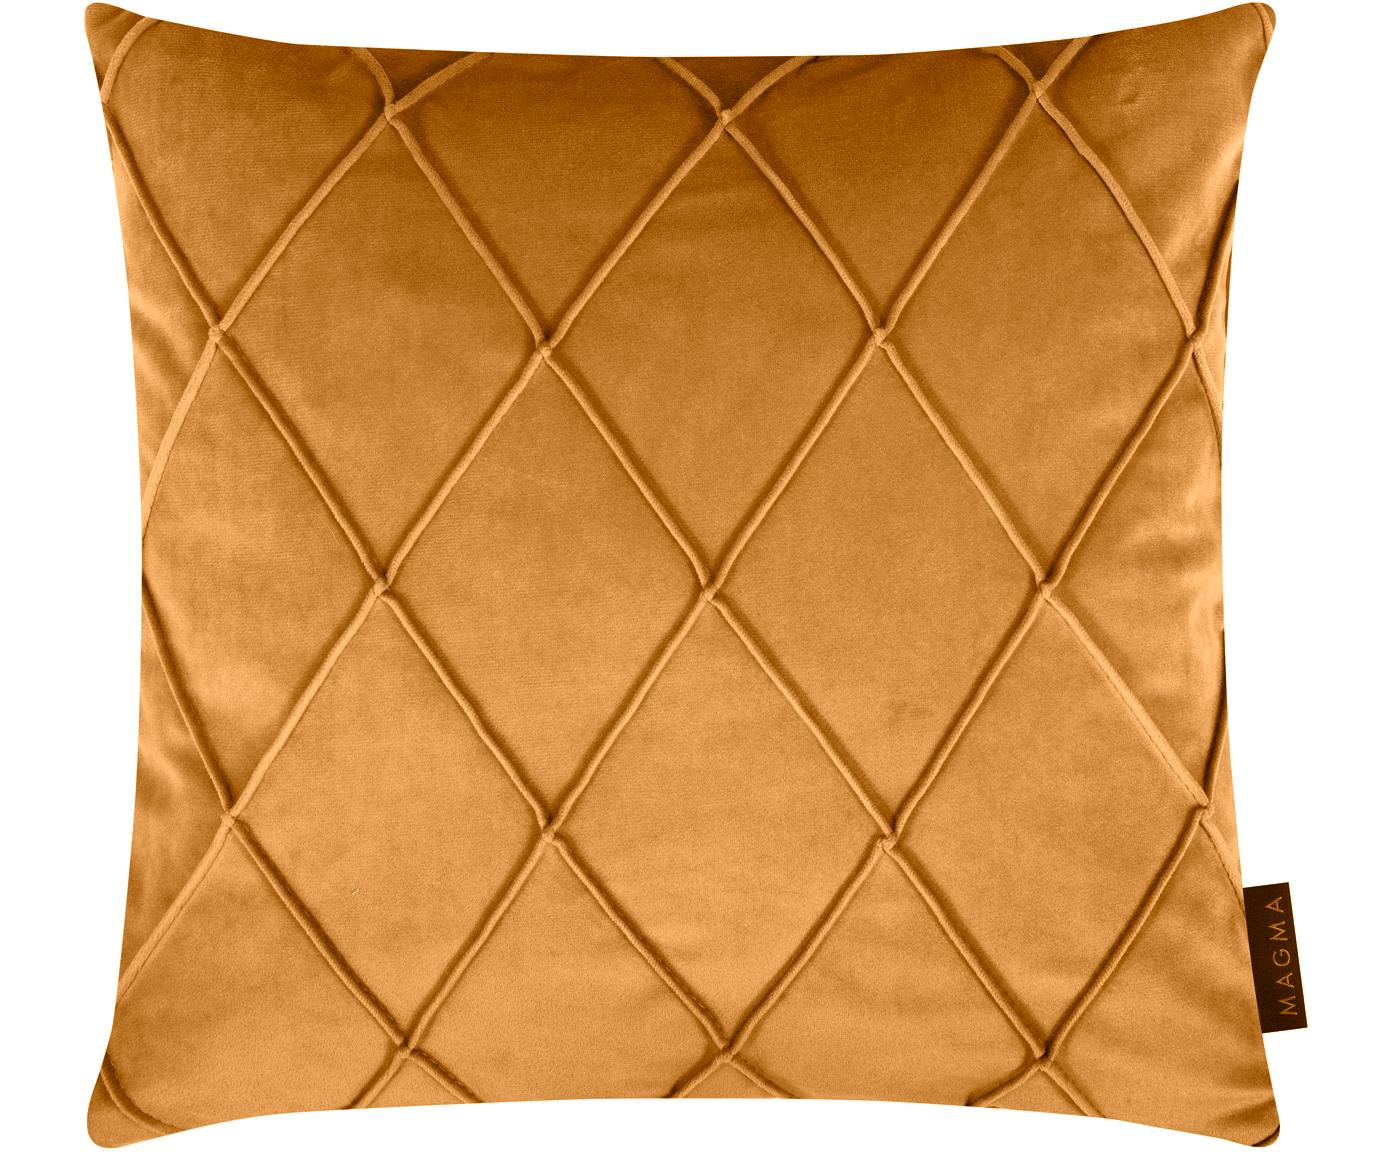 Fluwelen kussenhoes Nobless, Polyesterfluweel, Geel, 40 x 40 cm